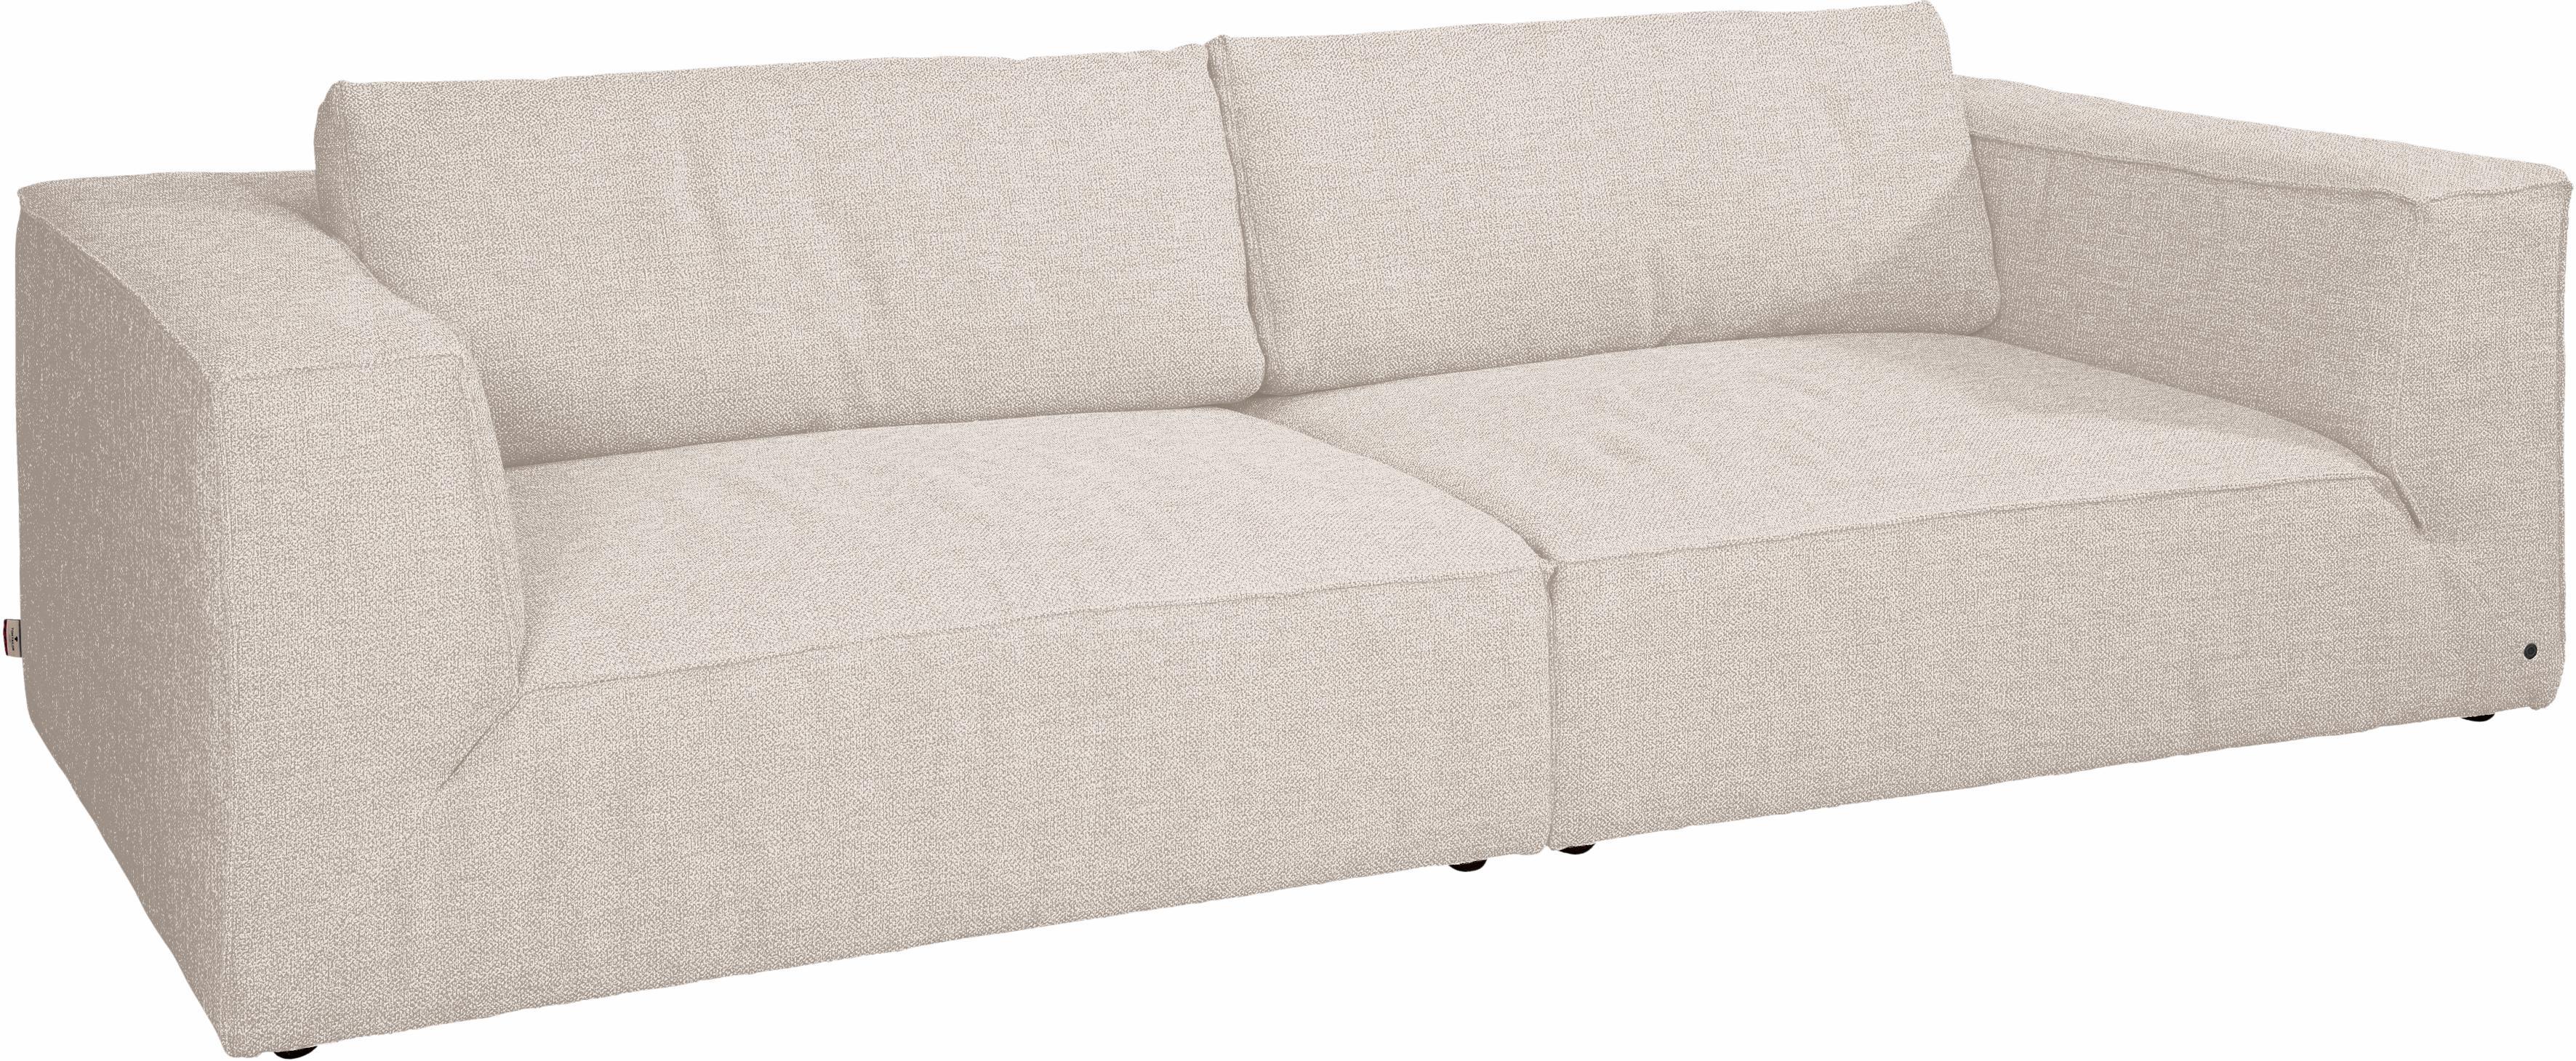 TOM TAILOR Big-Sofa BIG CUBE STYLE